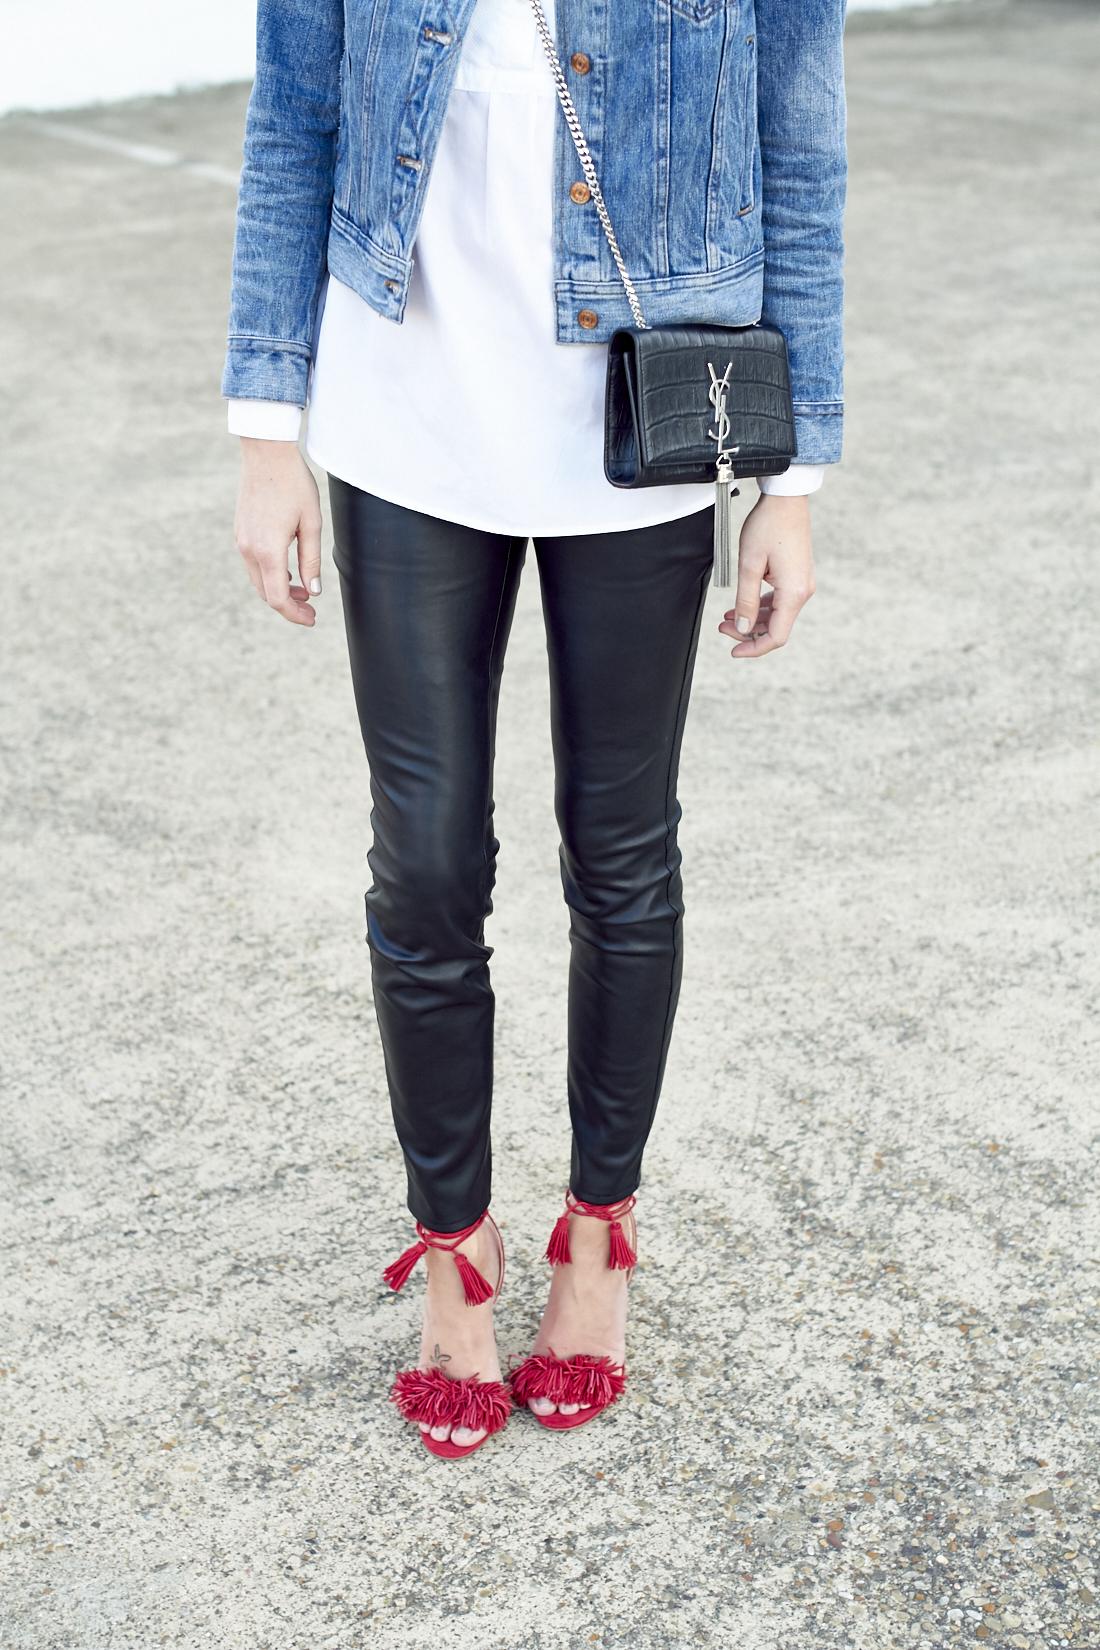 fashion-jackson-black-faux-leather-pants-red-fringe-heels-denim-jacket-saint-laurent-monogram-handbag